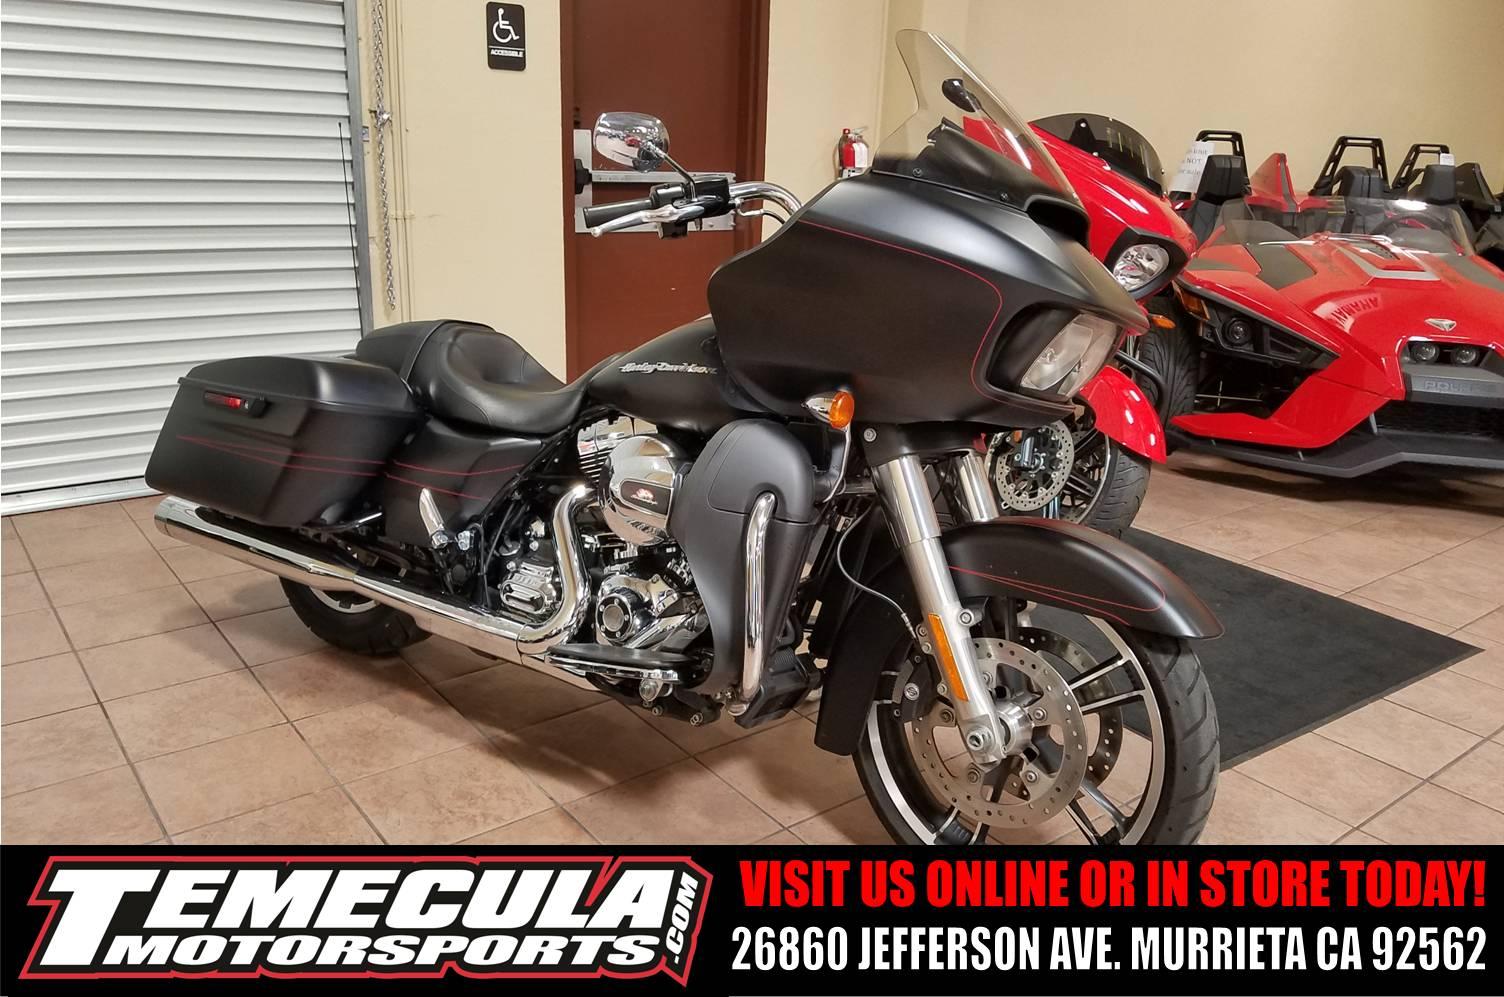 2015 Harley-Davidson Road Glide® Special in Murrieta, California